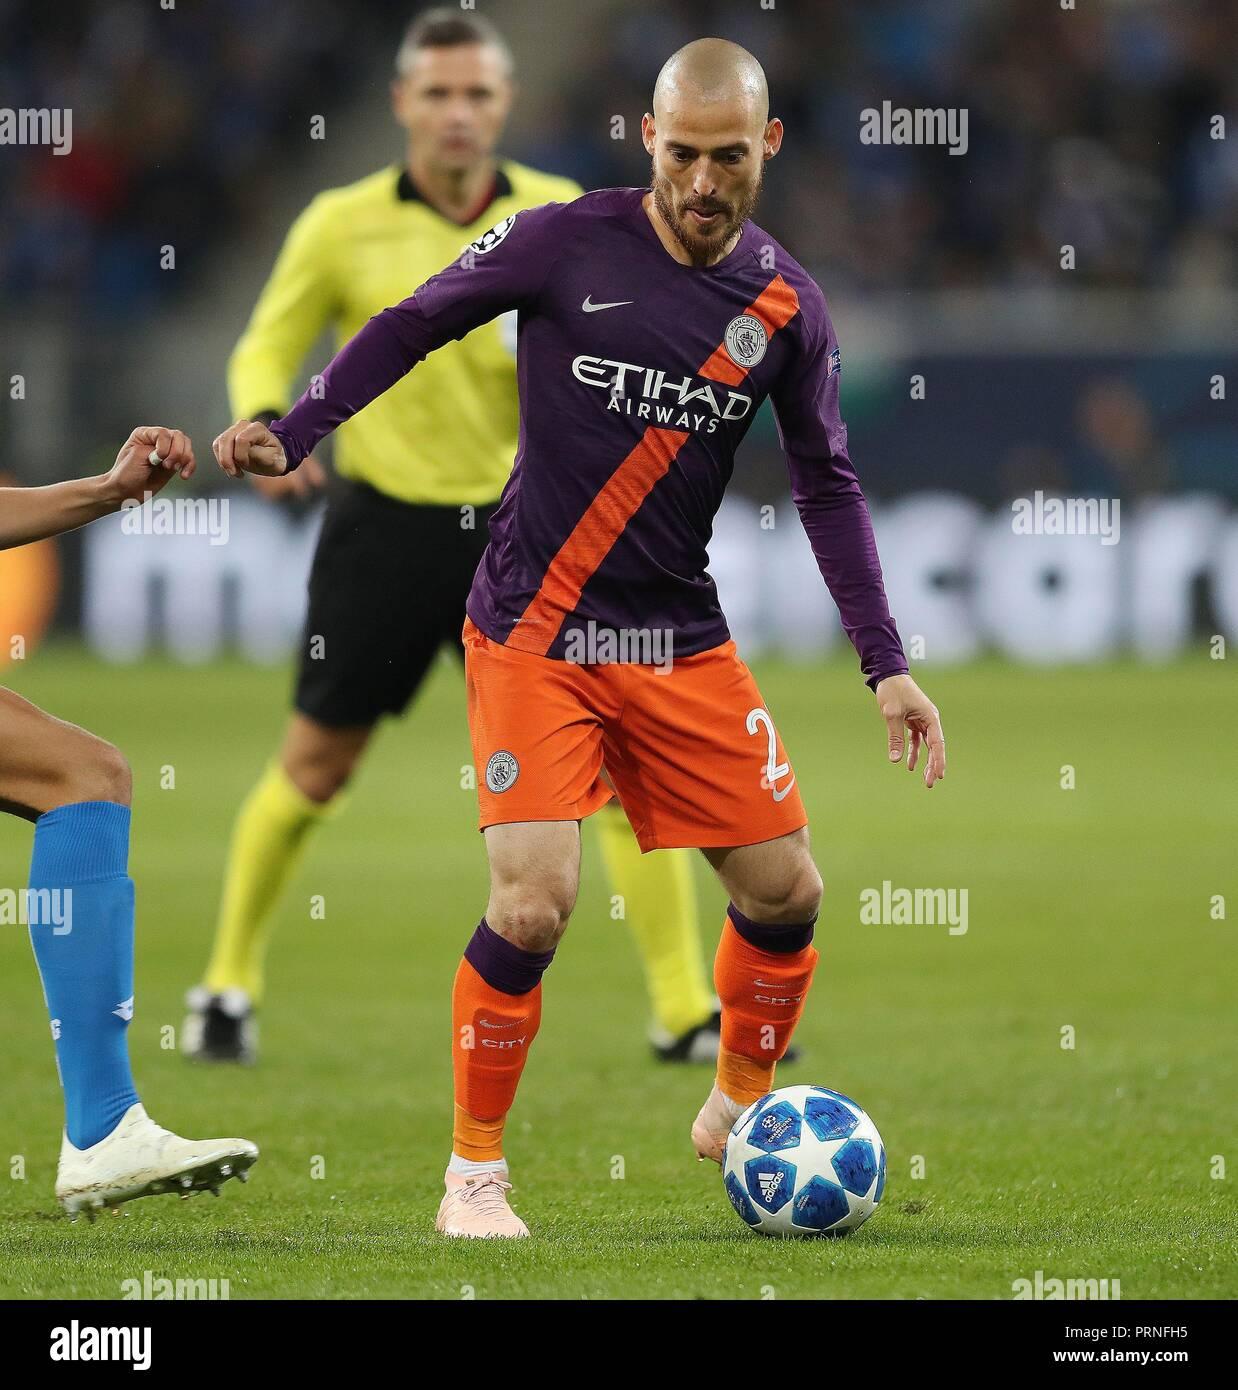 firo: 02.10.2018 Football, Football, Champions League: TSG Hoffenheim - Manchester City 1: 2 single action, David Silva   usage worldwide - Stock Image